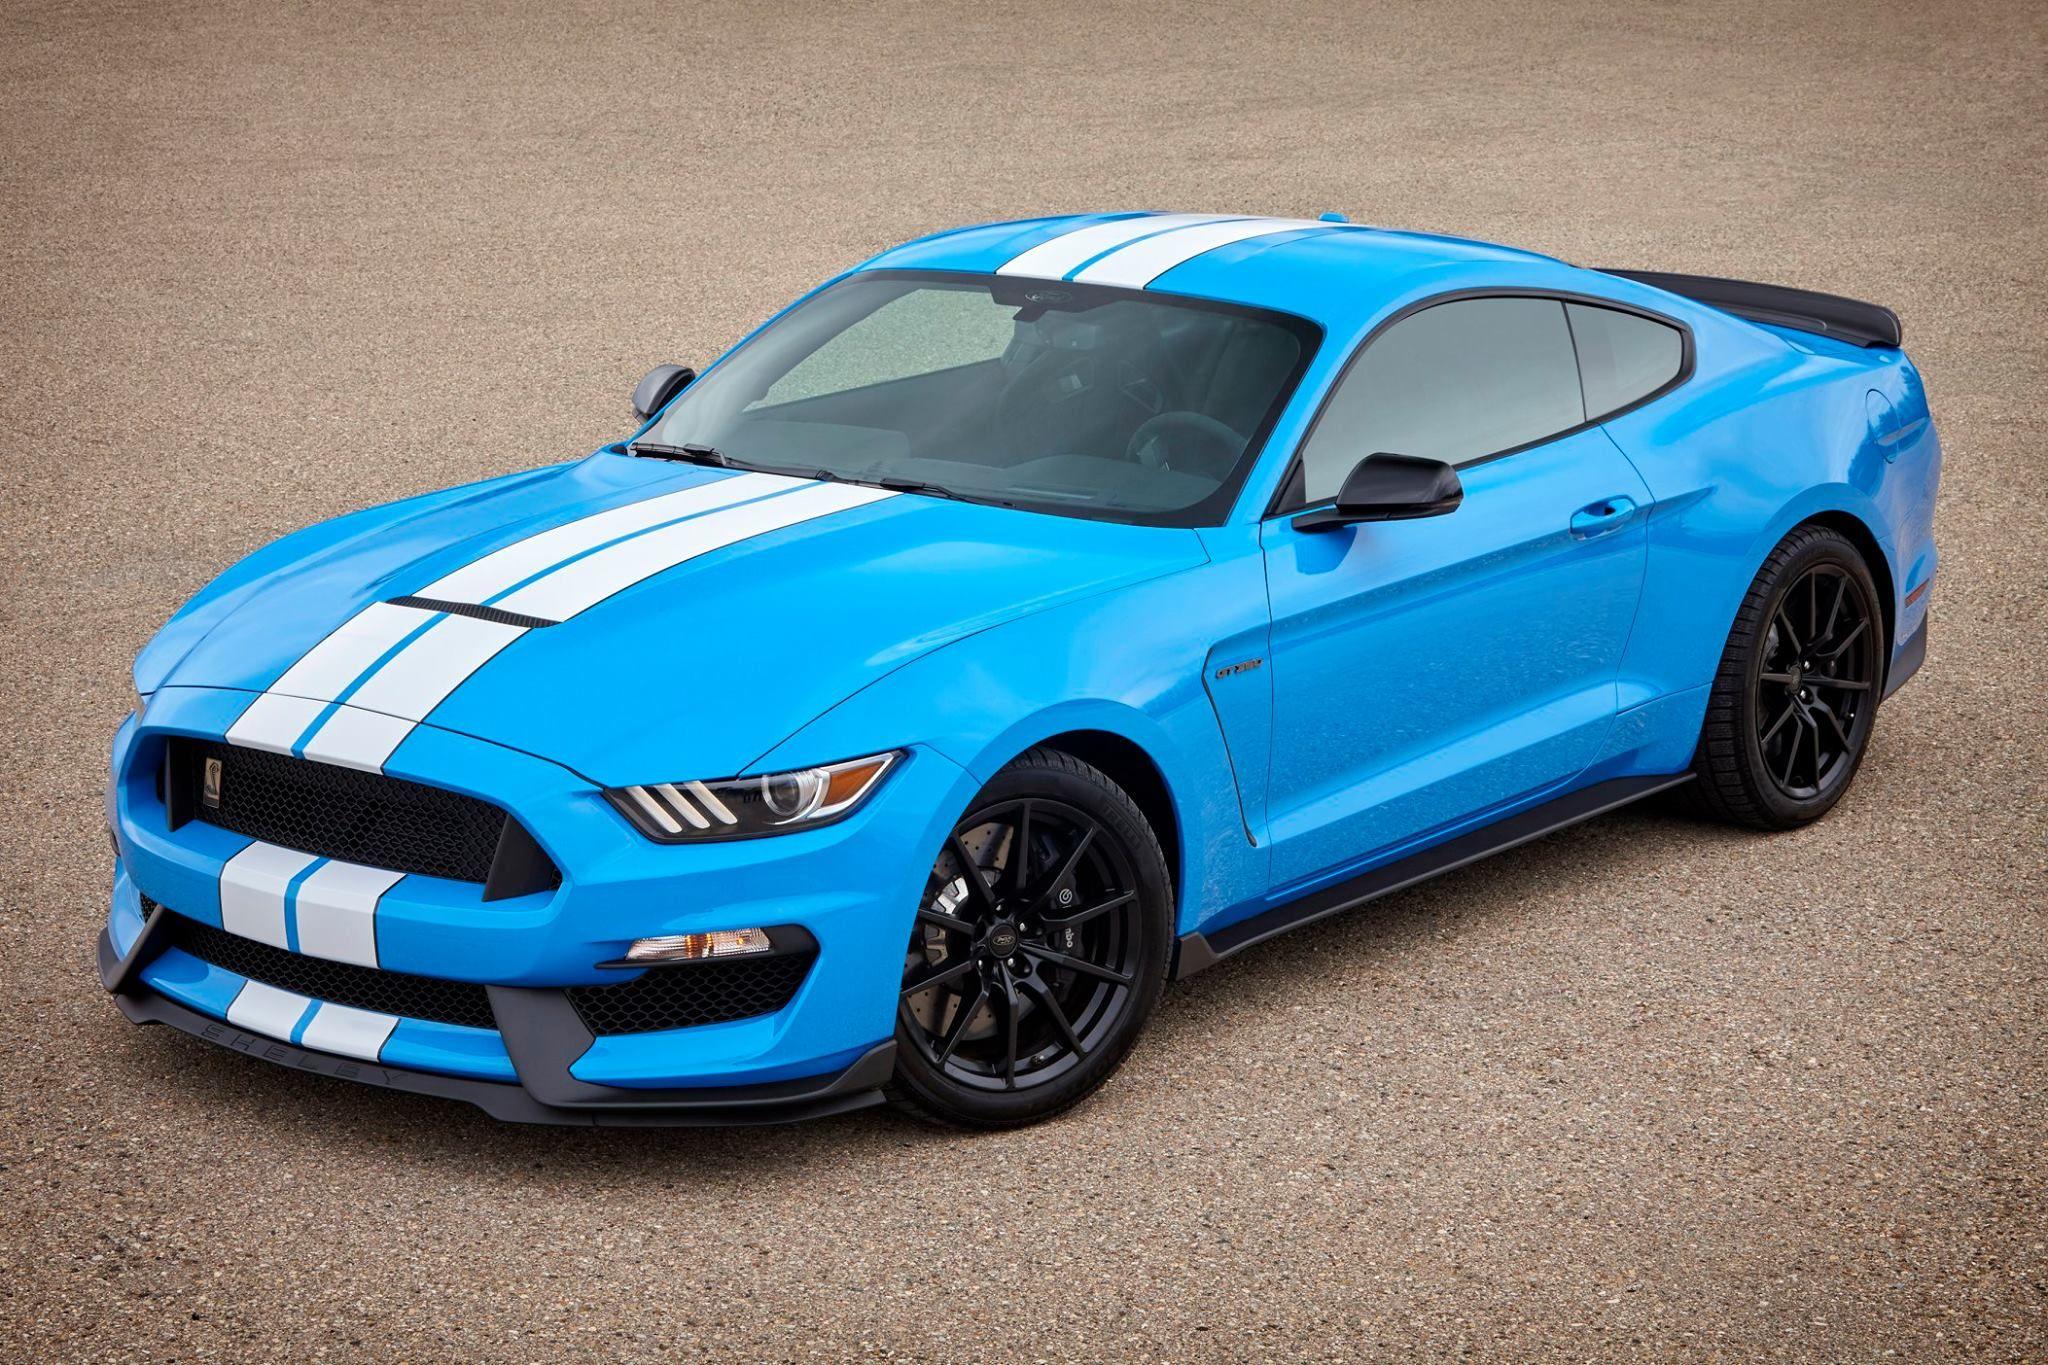 New 2017 shelby gt350r colors lightning blue grabber blue